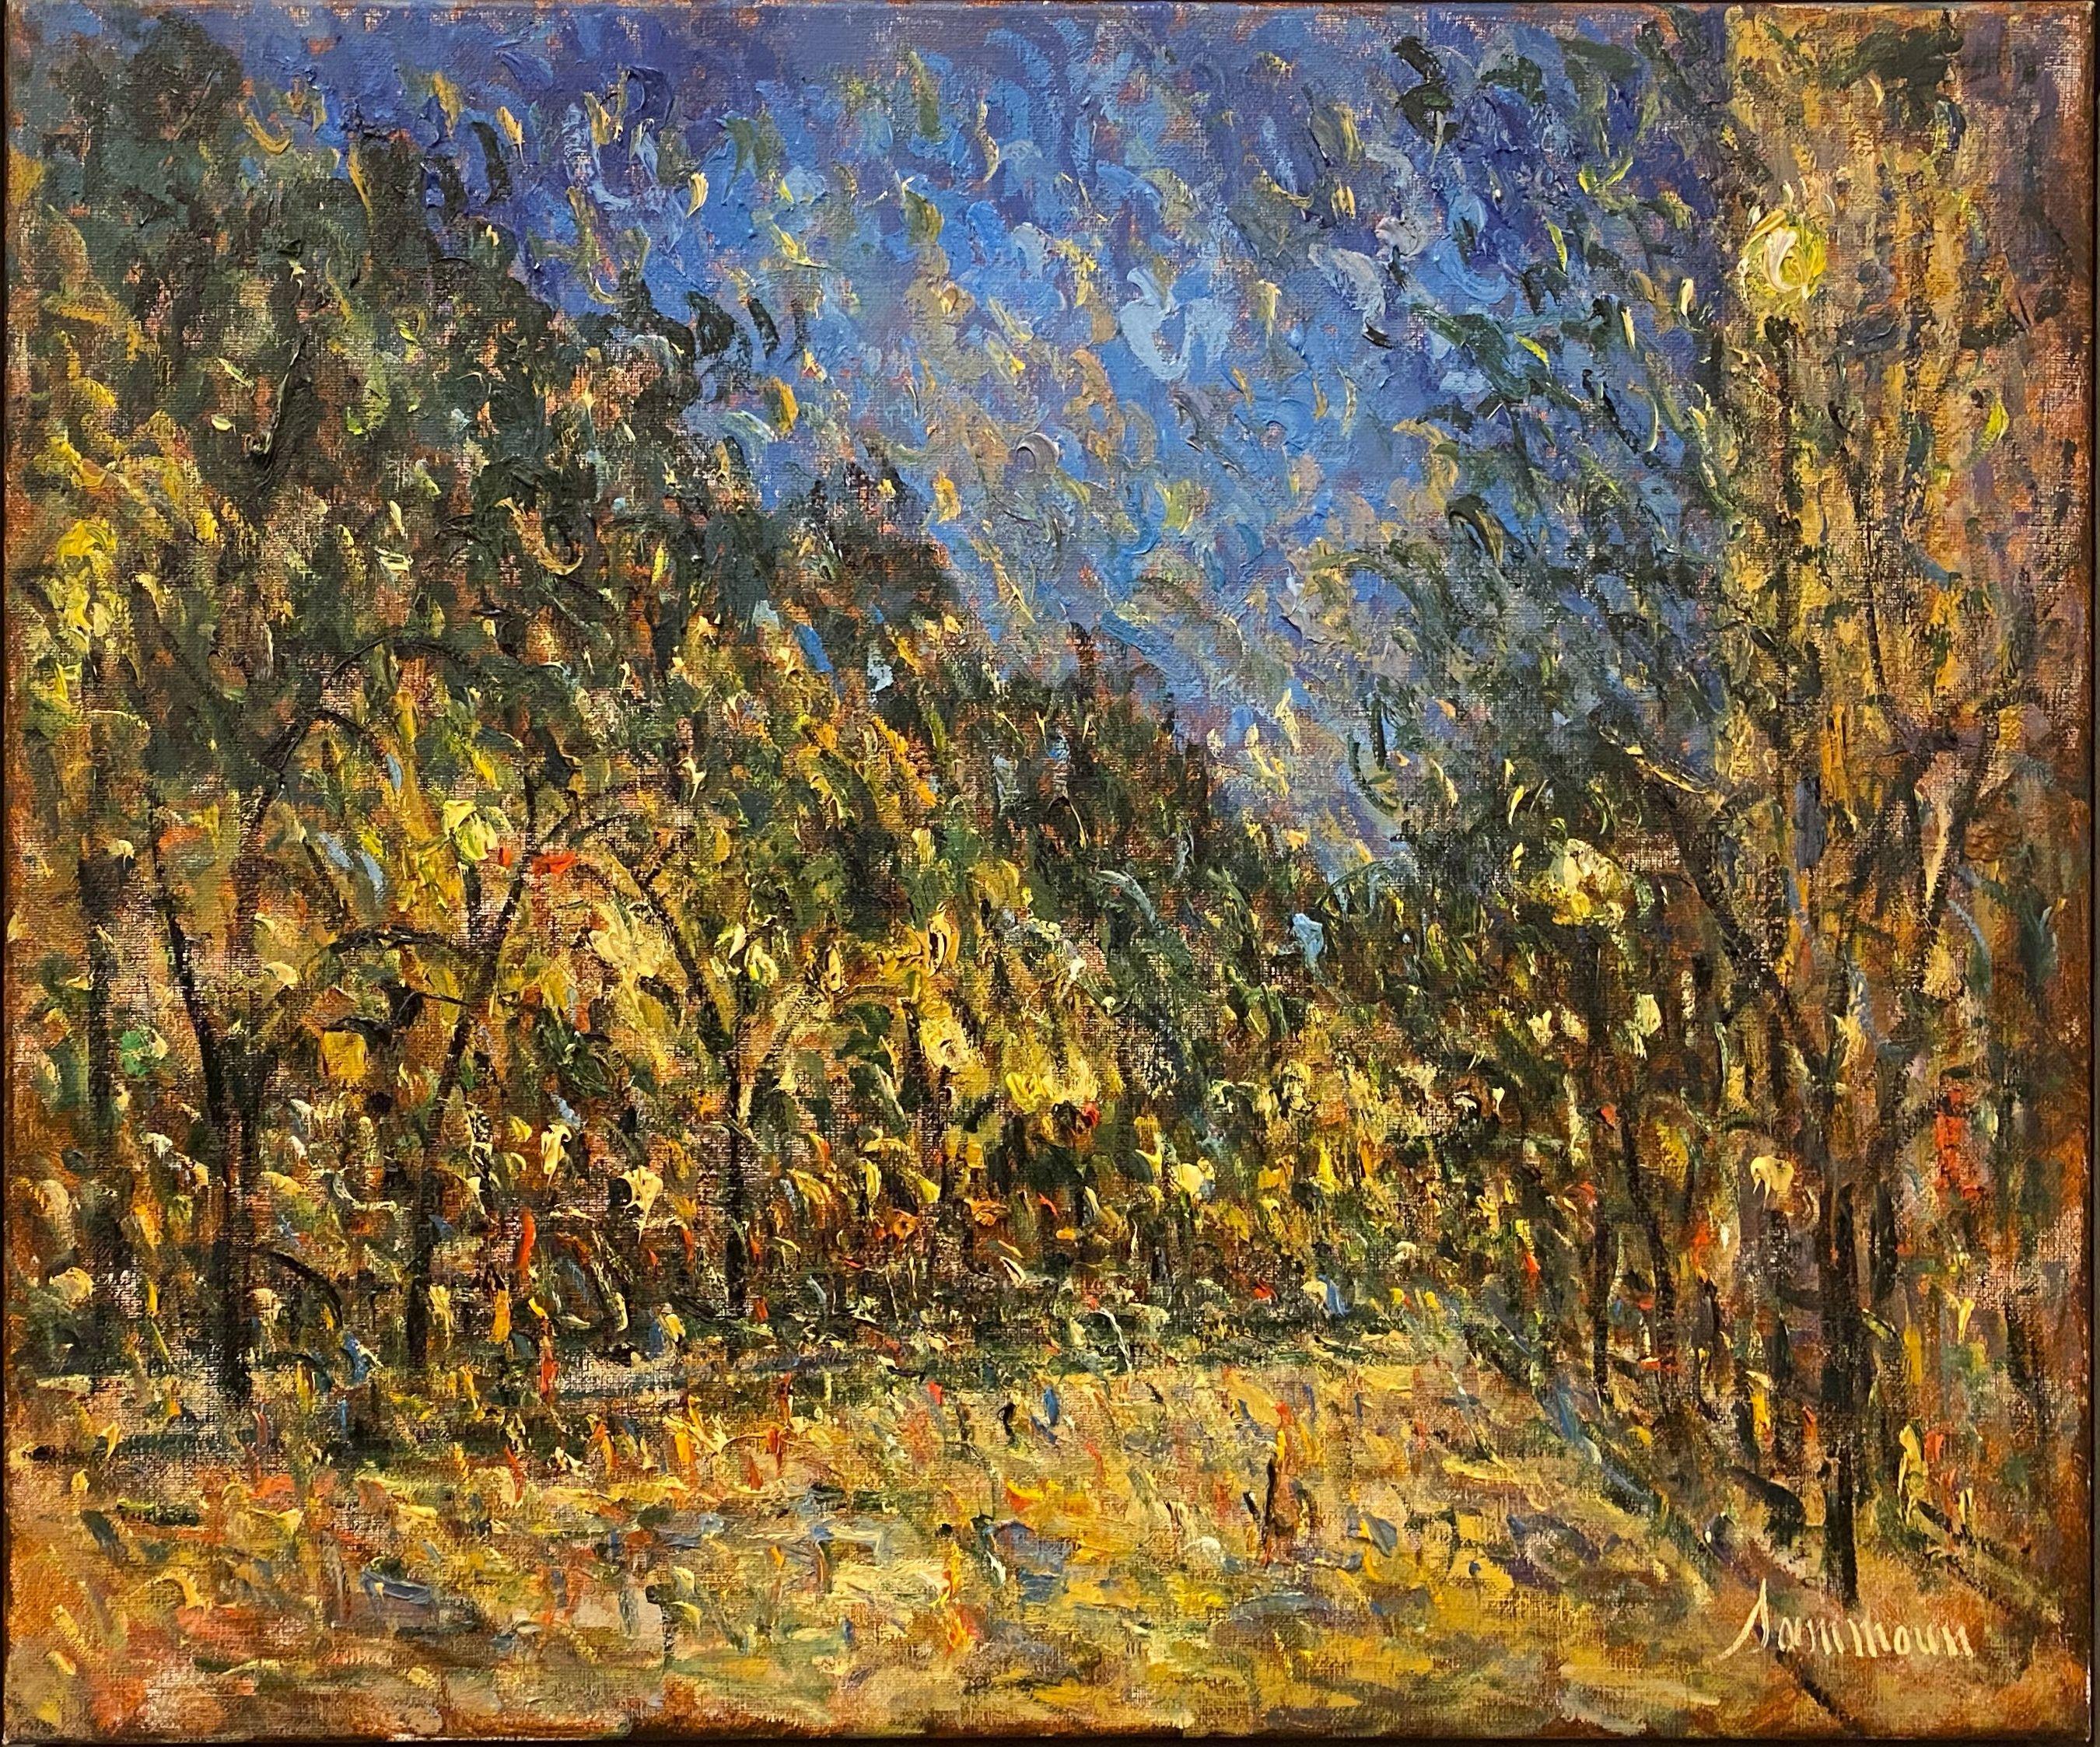 Samir Sammoun - Boston by Night - Original painting - Off The Wall Gallery Houston